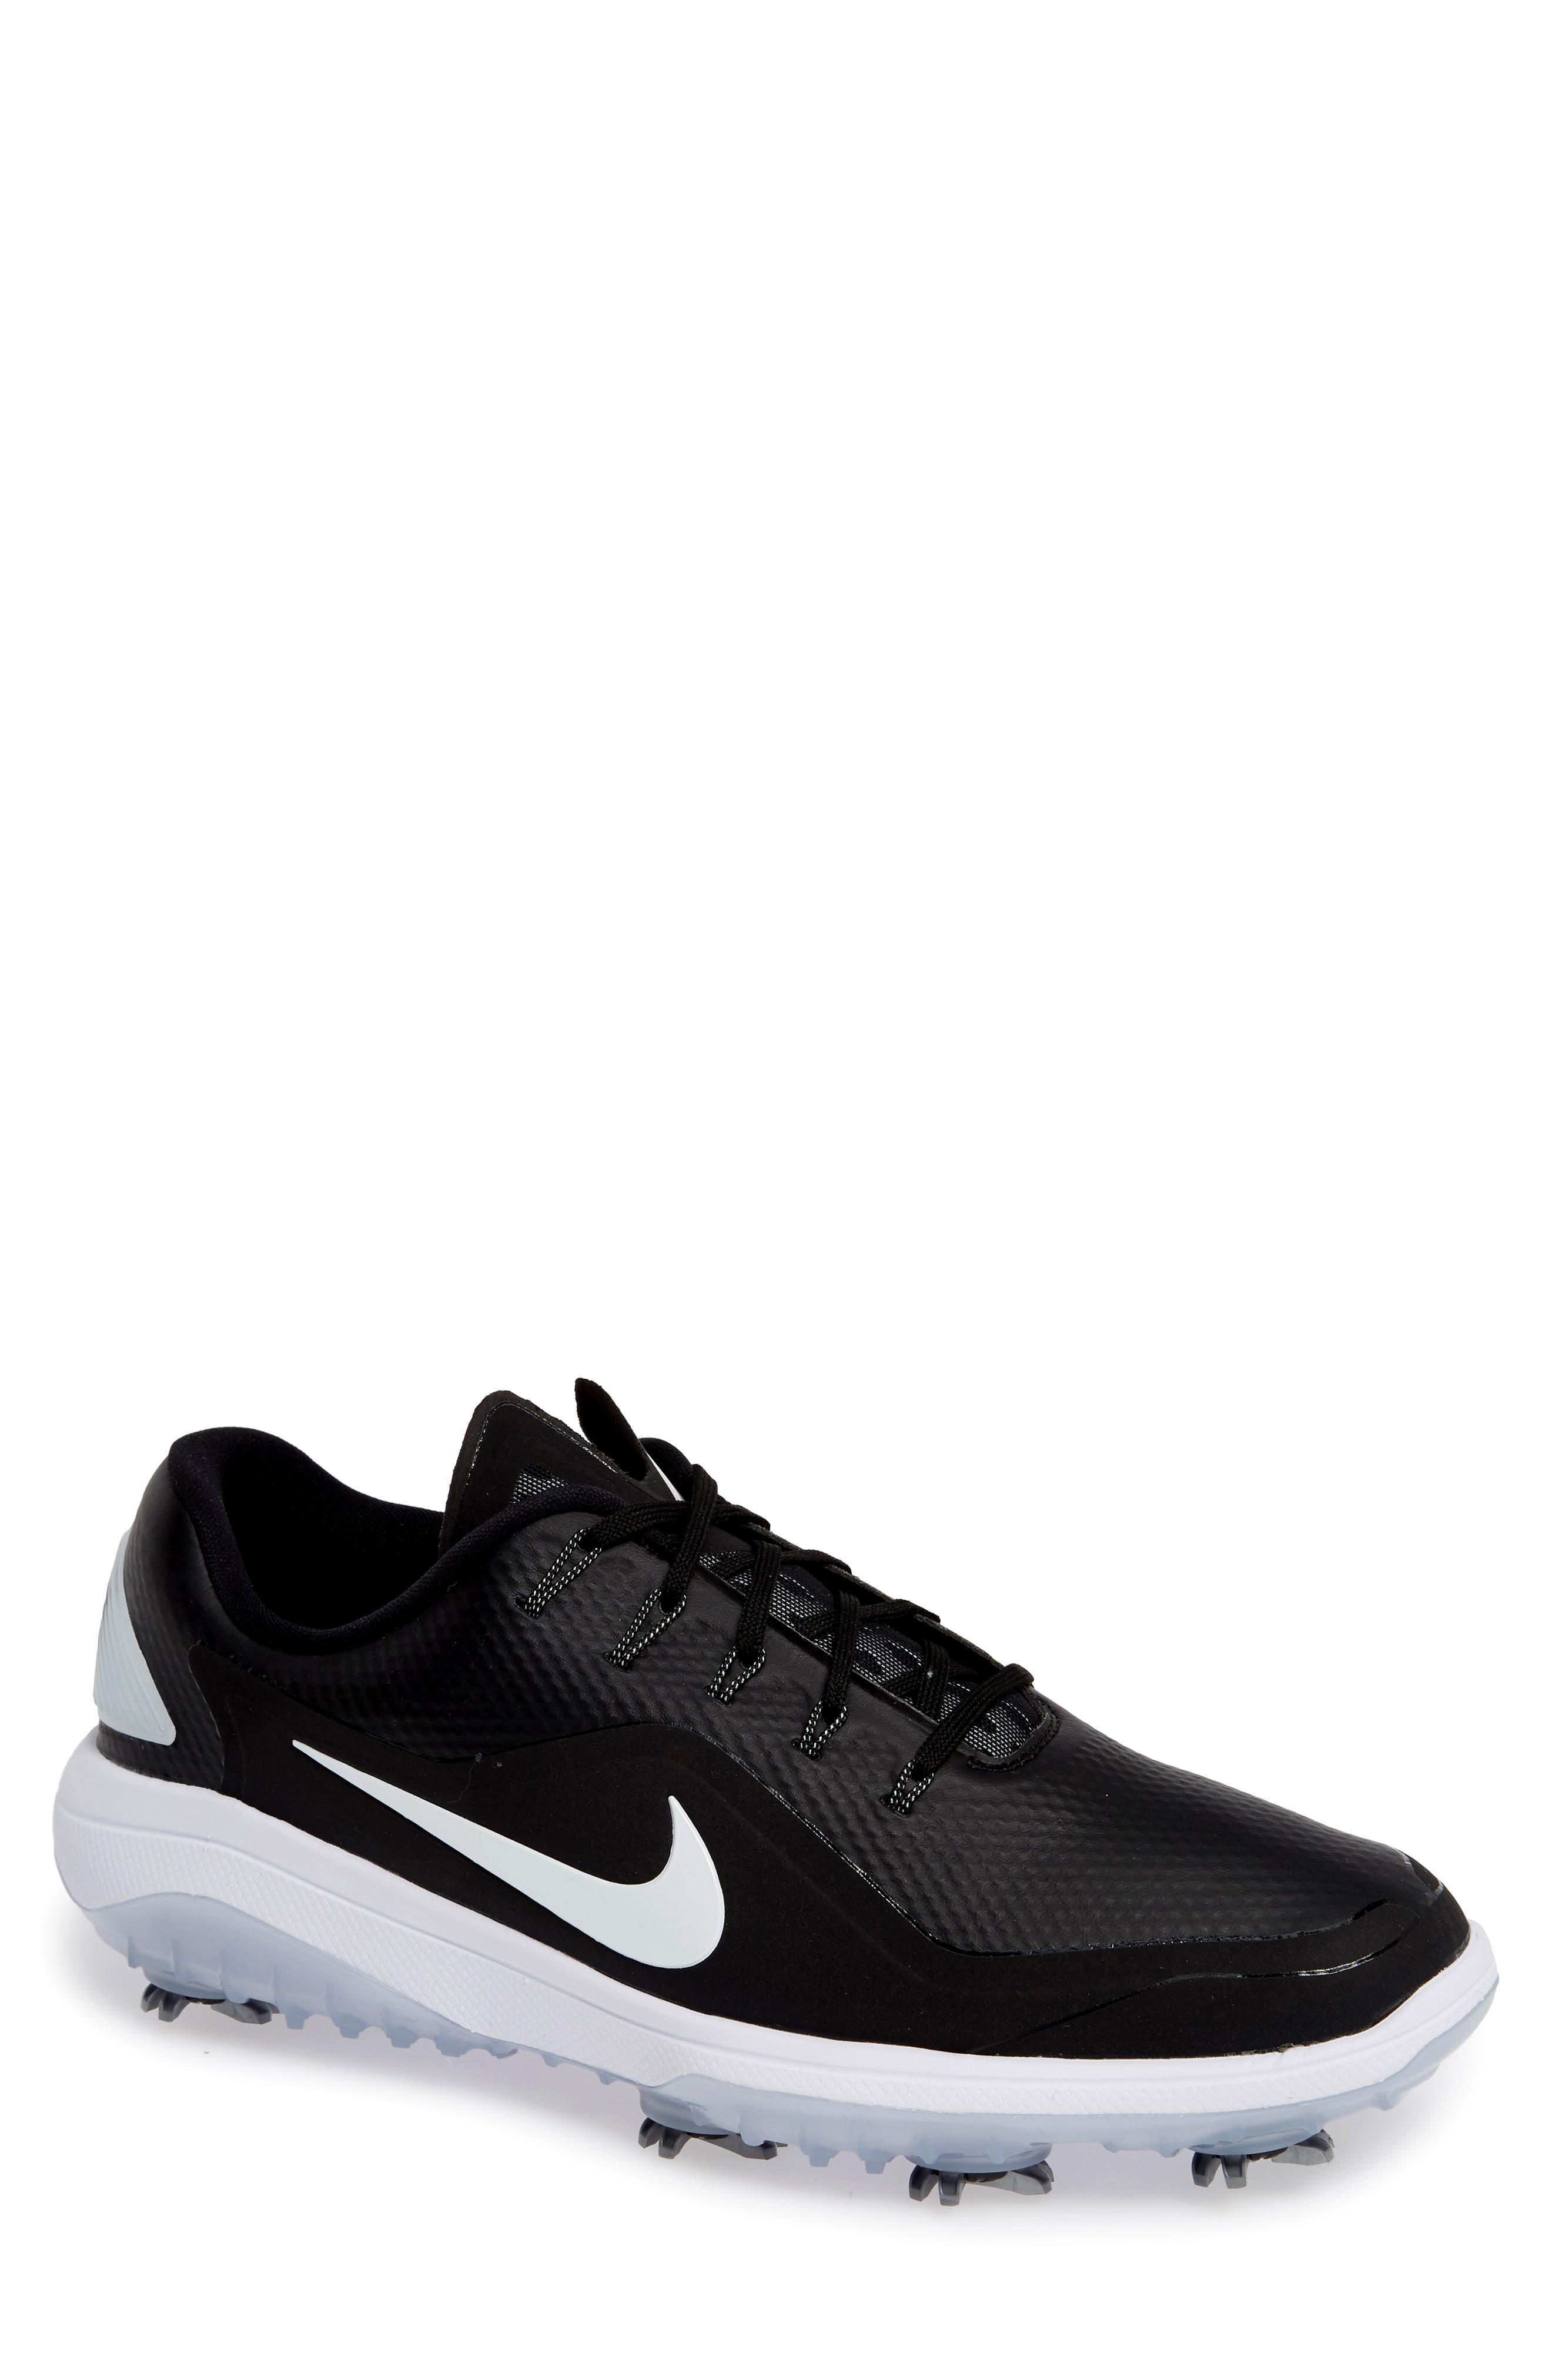 NIKE React Vapor 2 Golf Shoe, Main, color, BLACK/ METALLIC WHITE